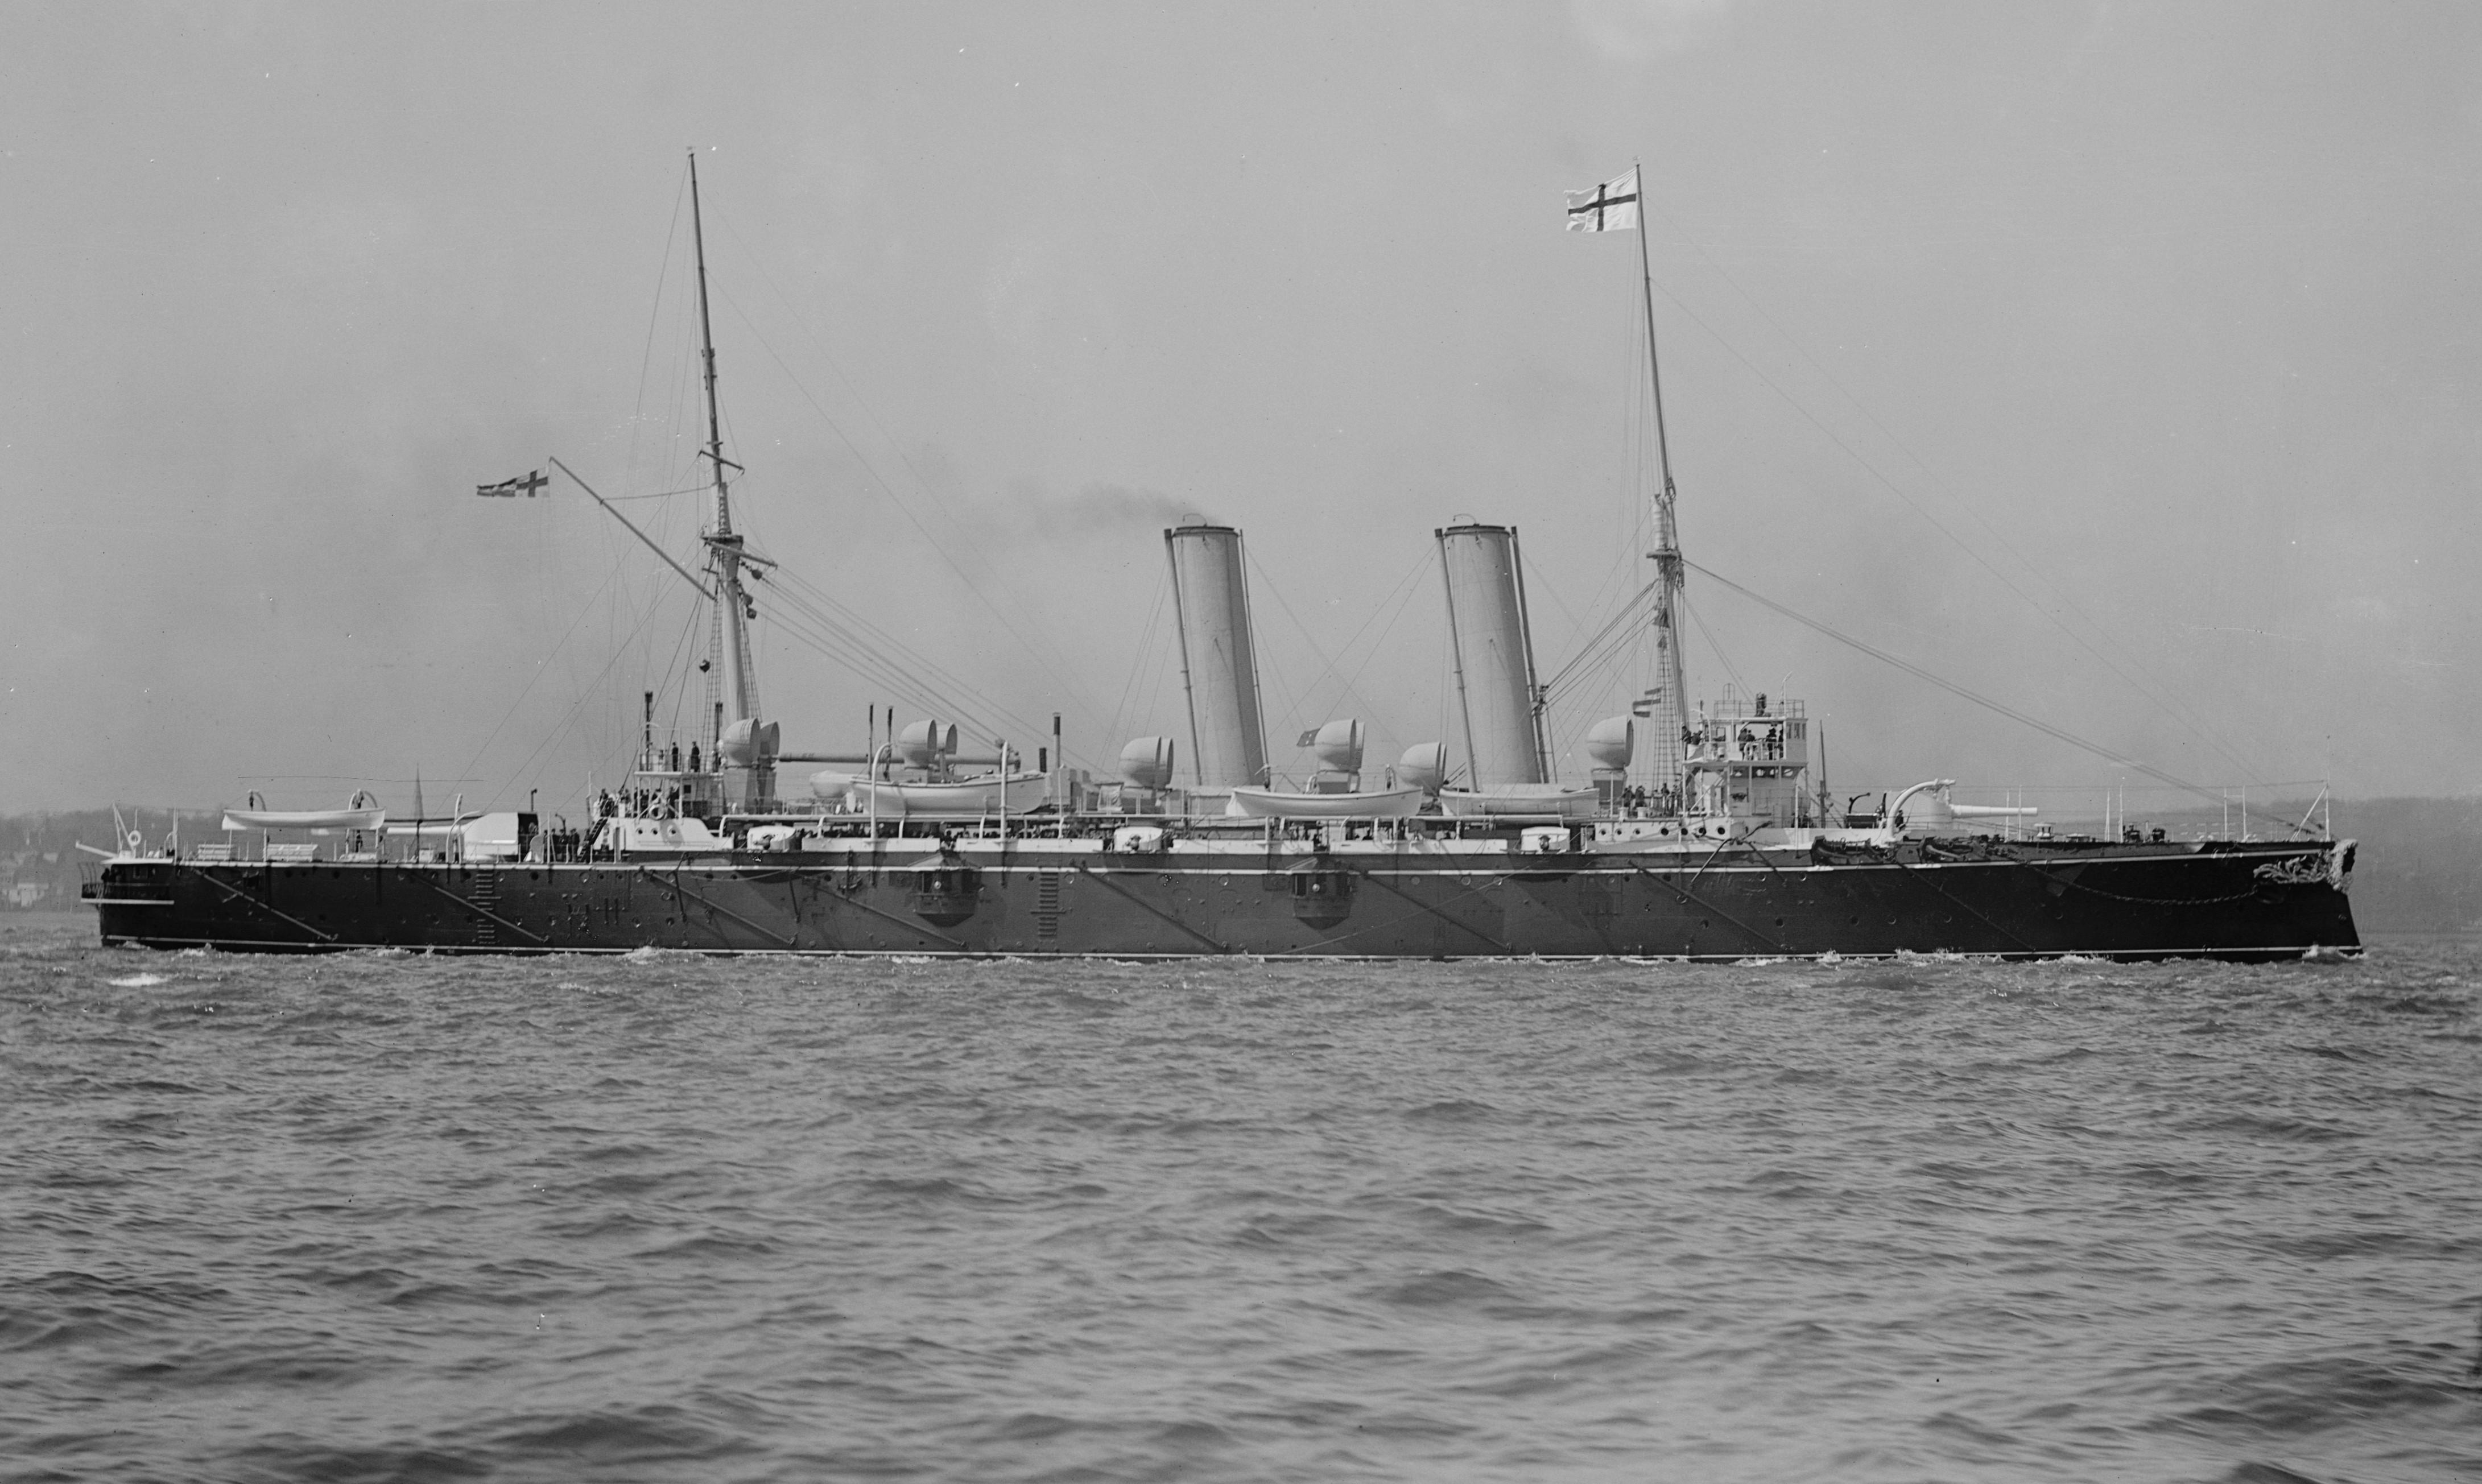 HMS_Blake_(2)_in_the_1890s